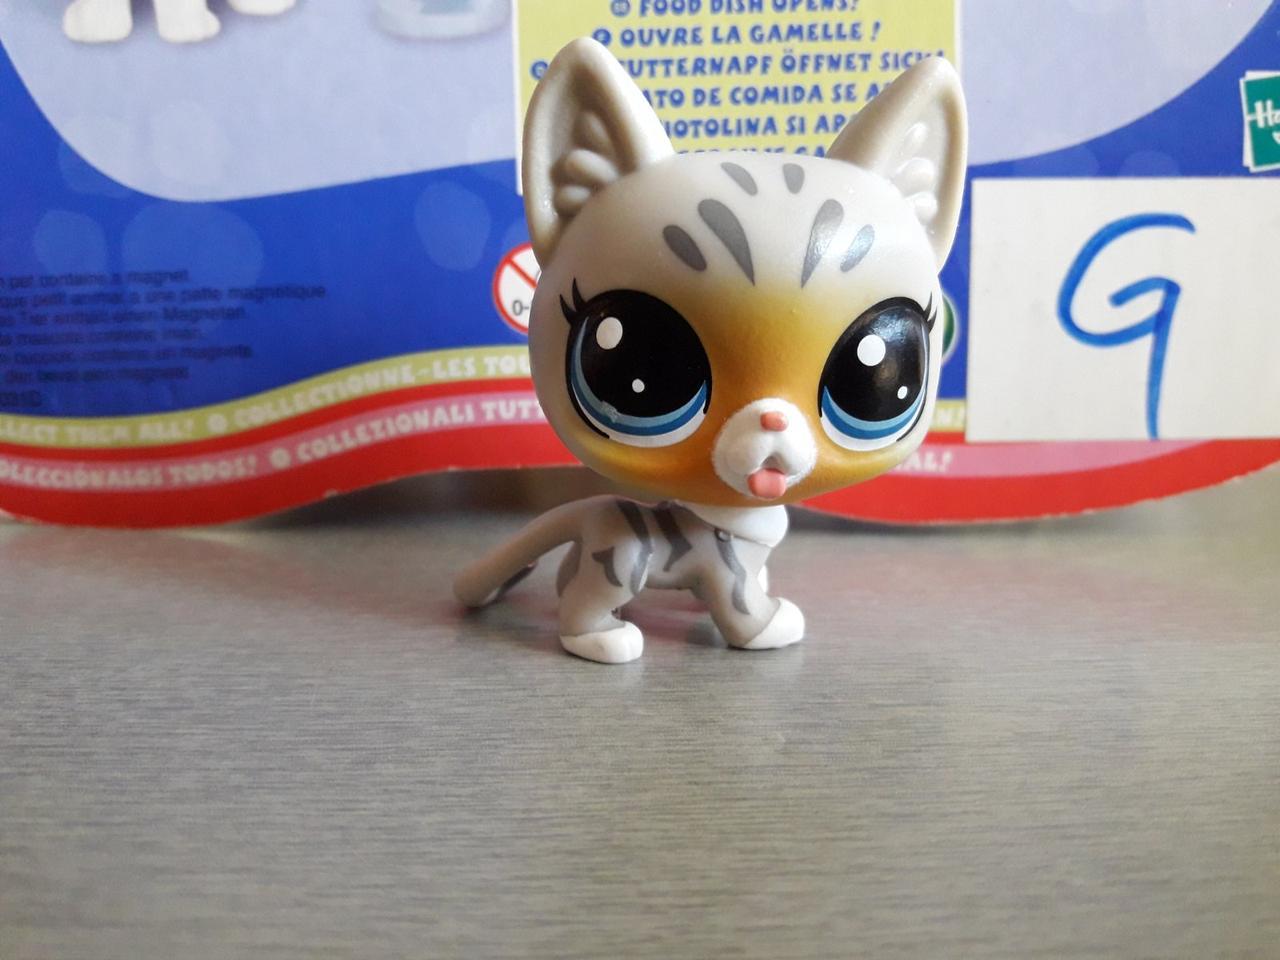 Littlest pet shop lps іграшка Hasbro лпс пет шоп котик